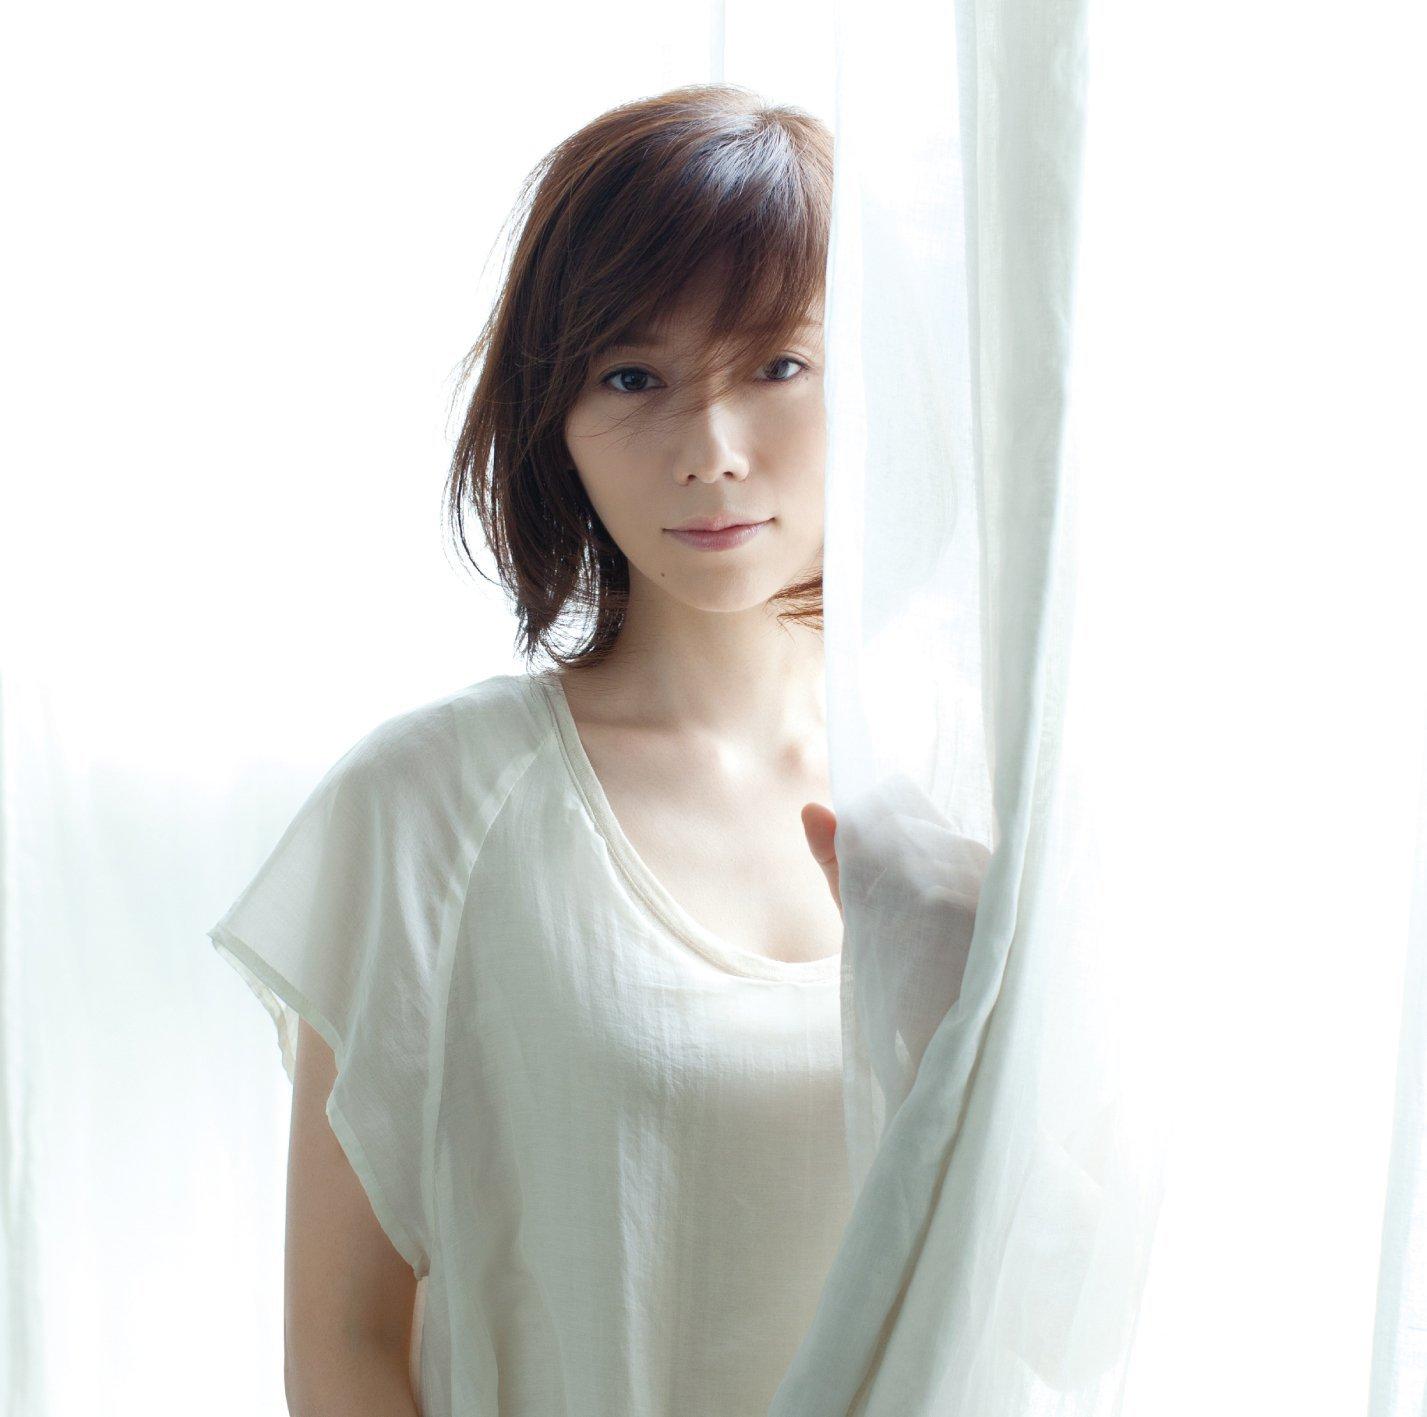 裕木奈江の画像 p1_23